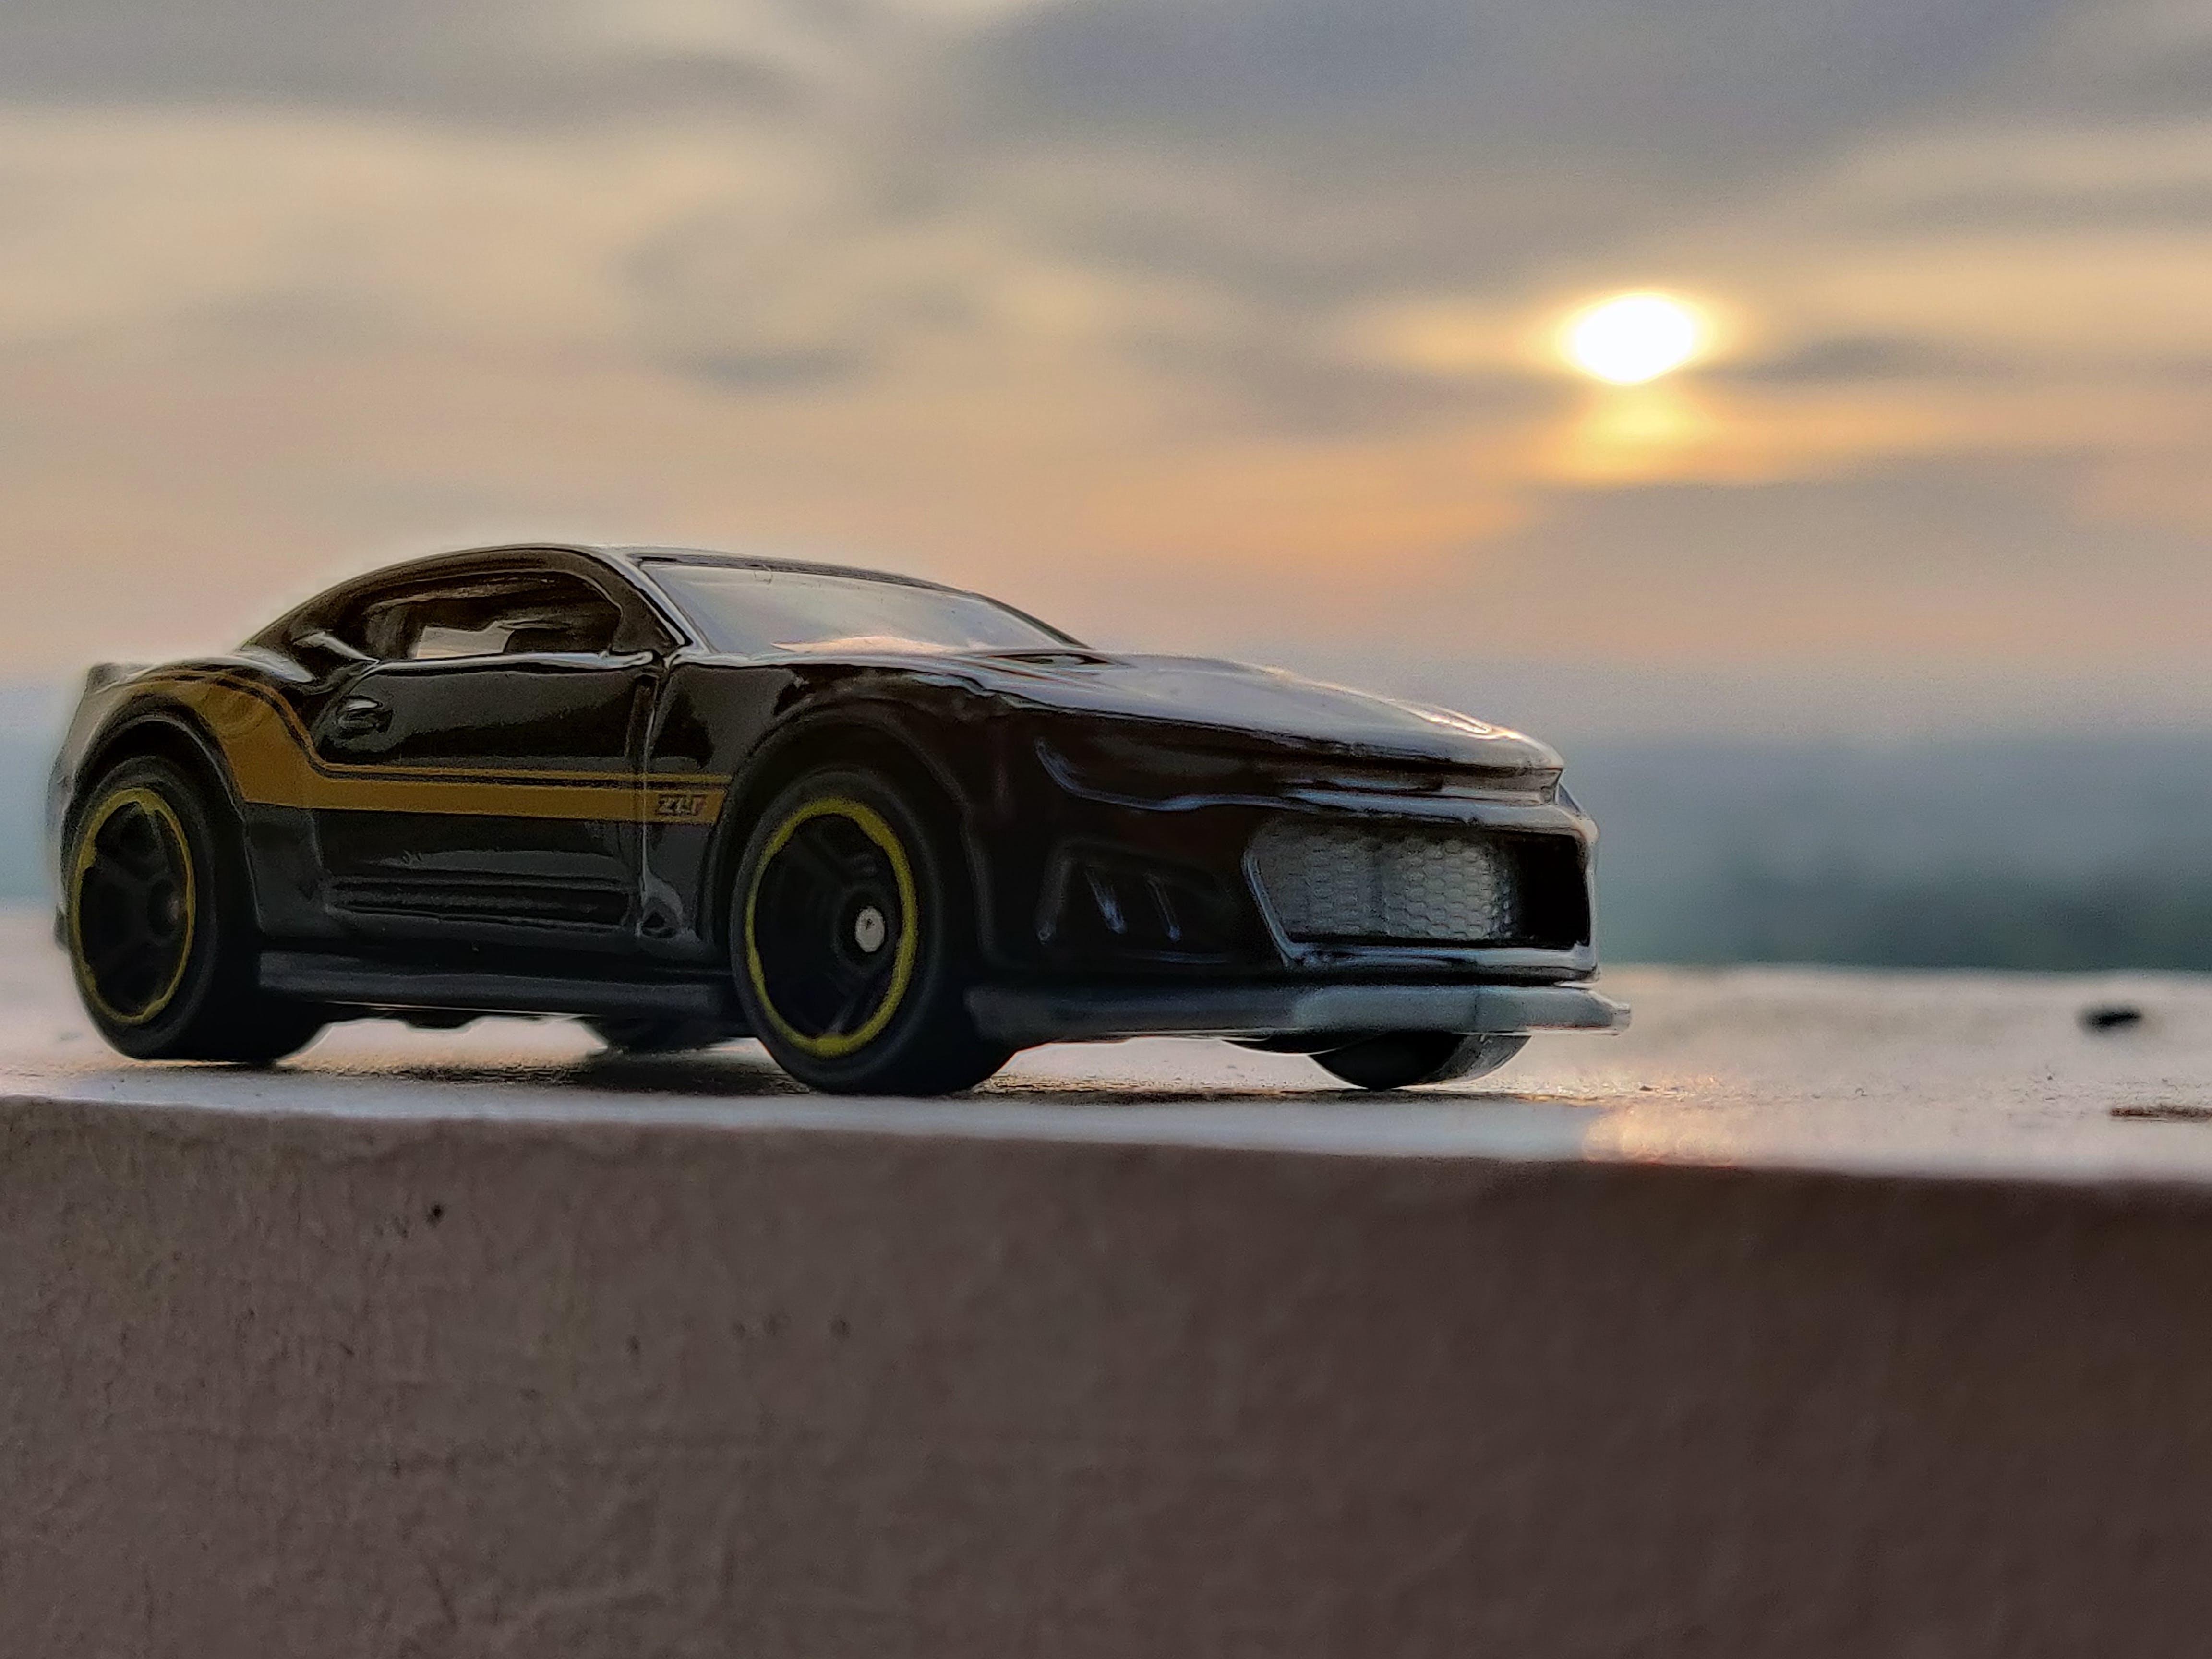 Free stock photo of car, macro photography, miniature toys